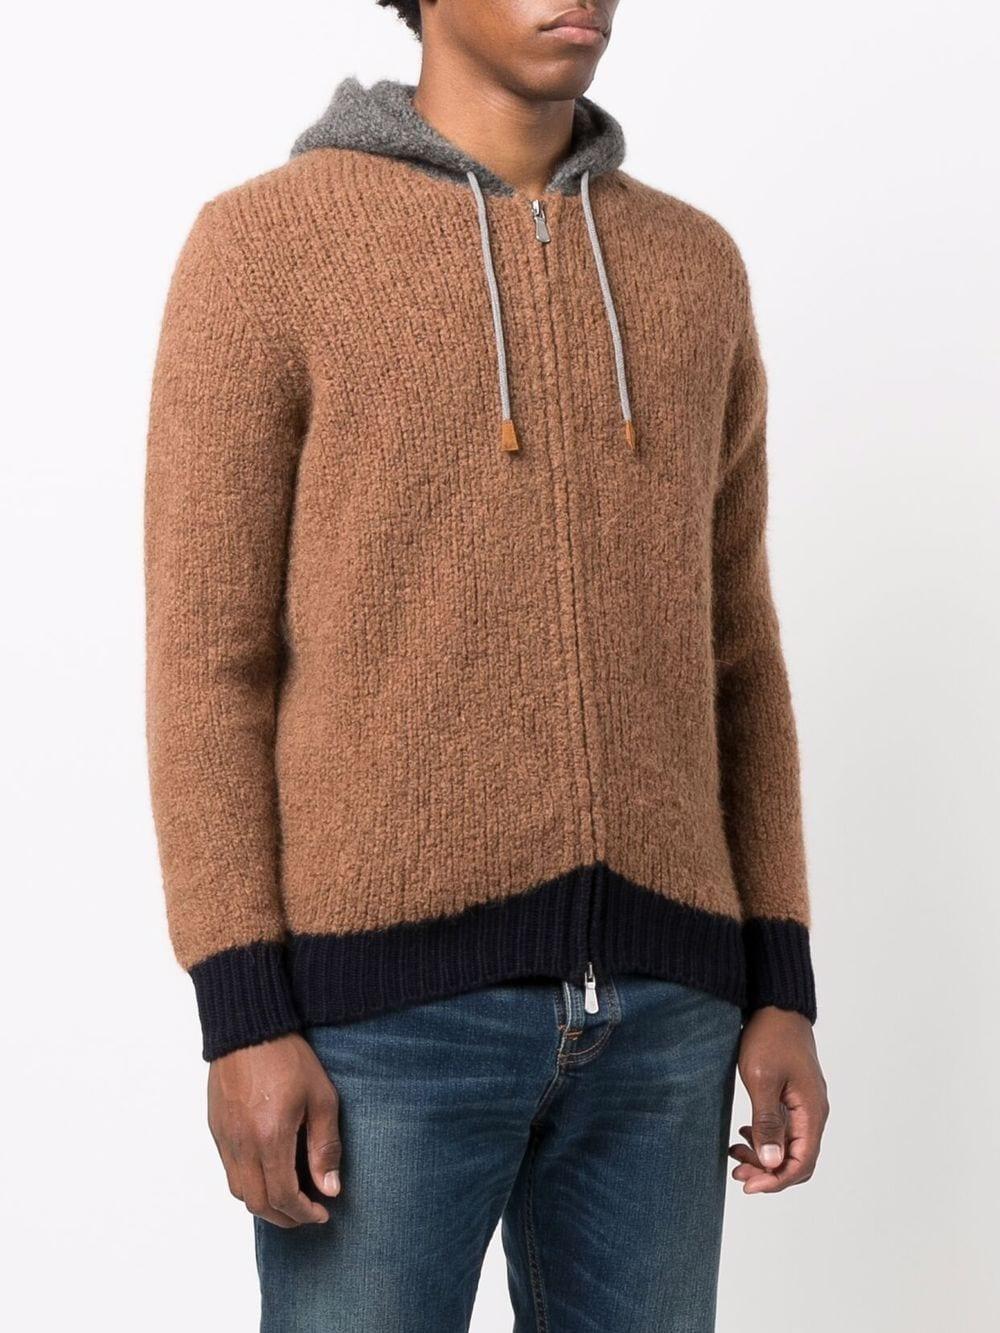 Cardigan in maglia di cashmere, lana e seta color cammello ELEVENTY   Cardigan   D76MAGD24-MAG0D01404